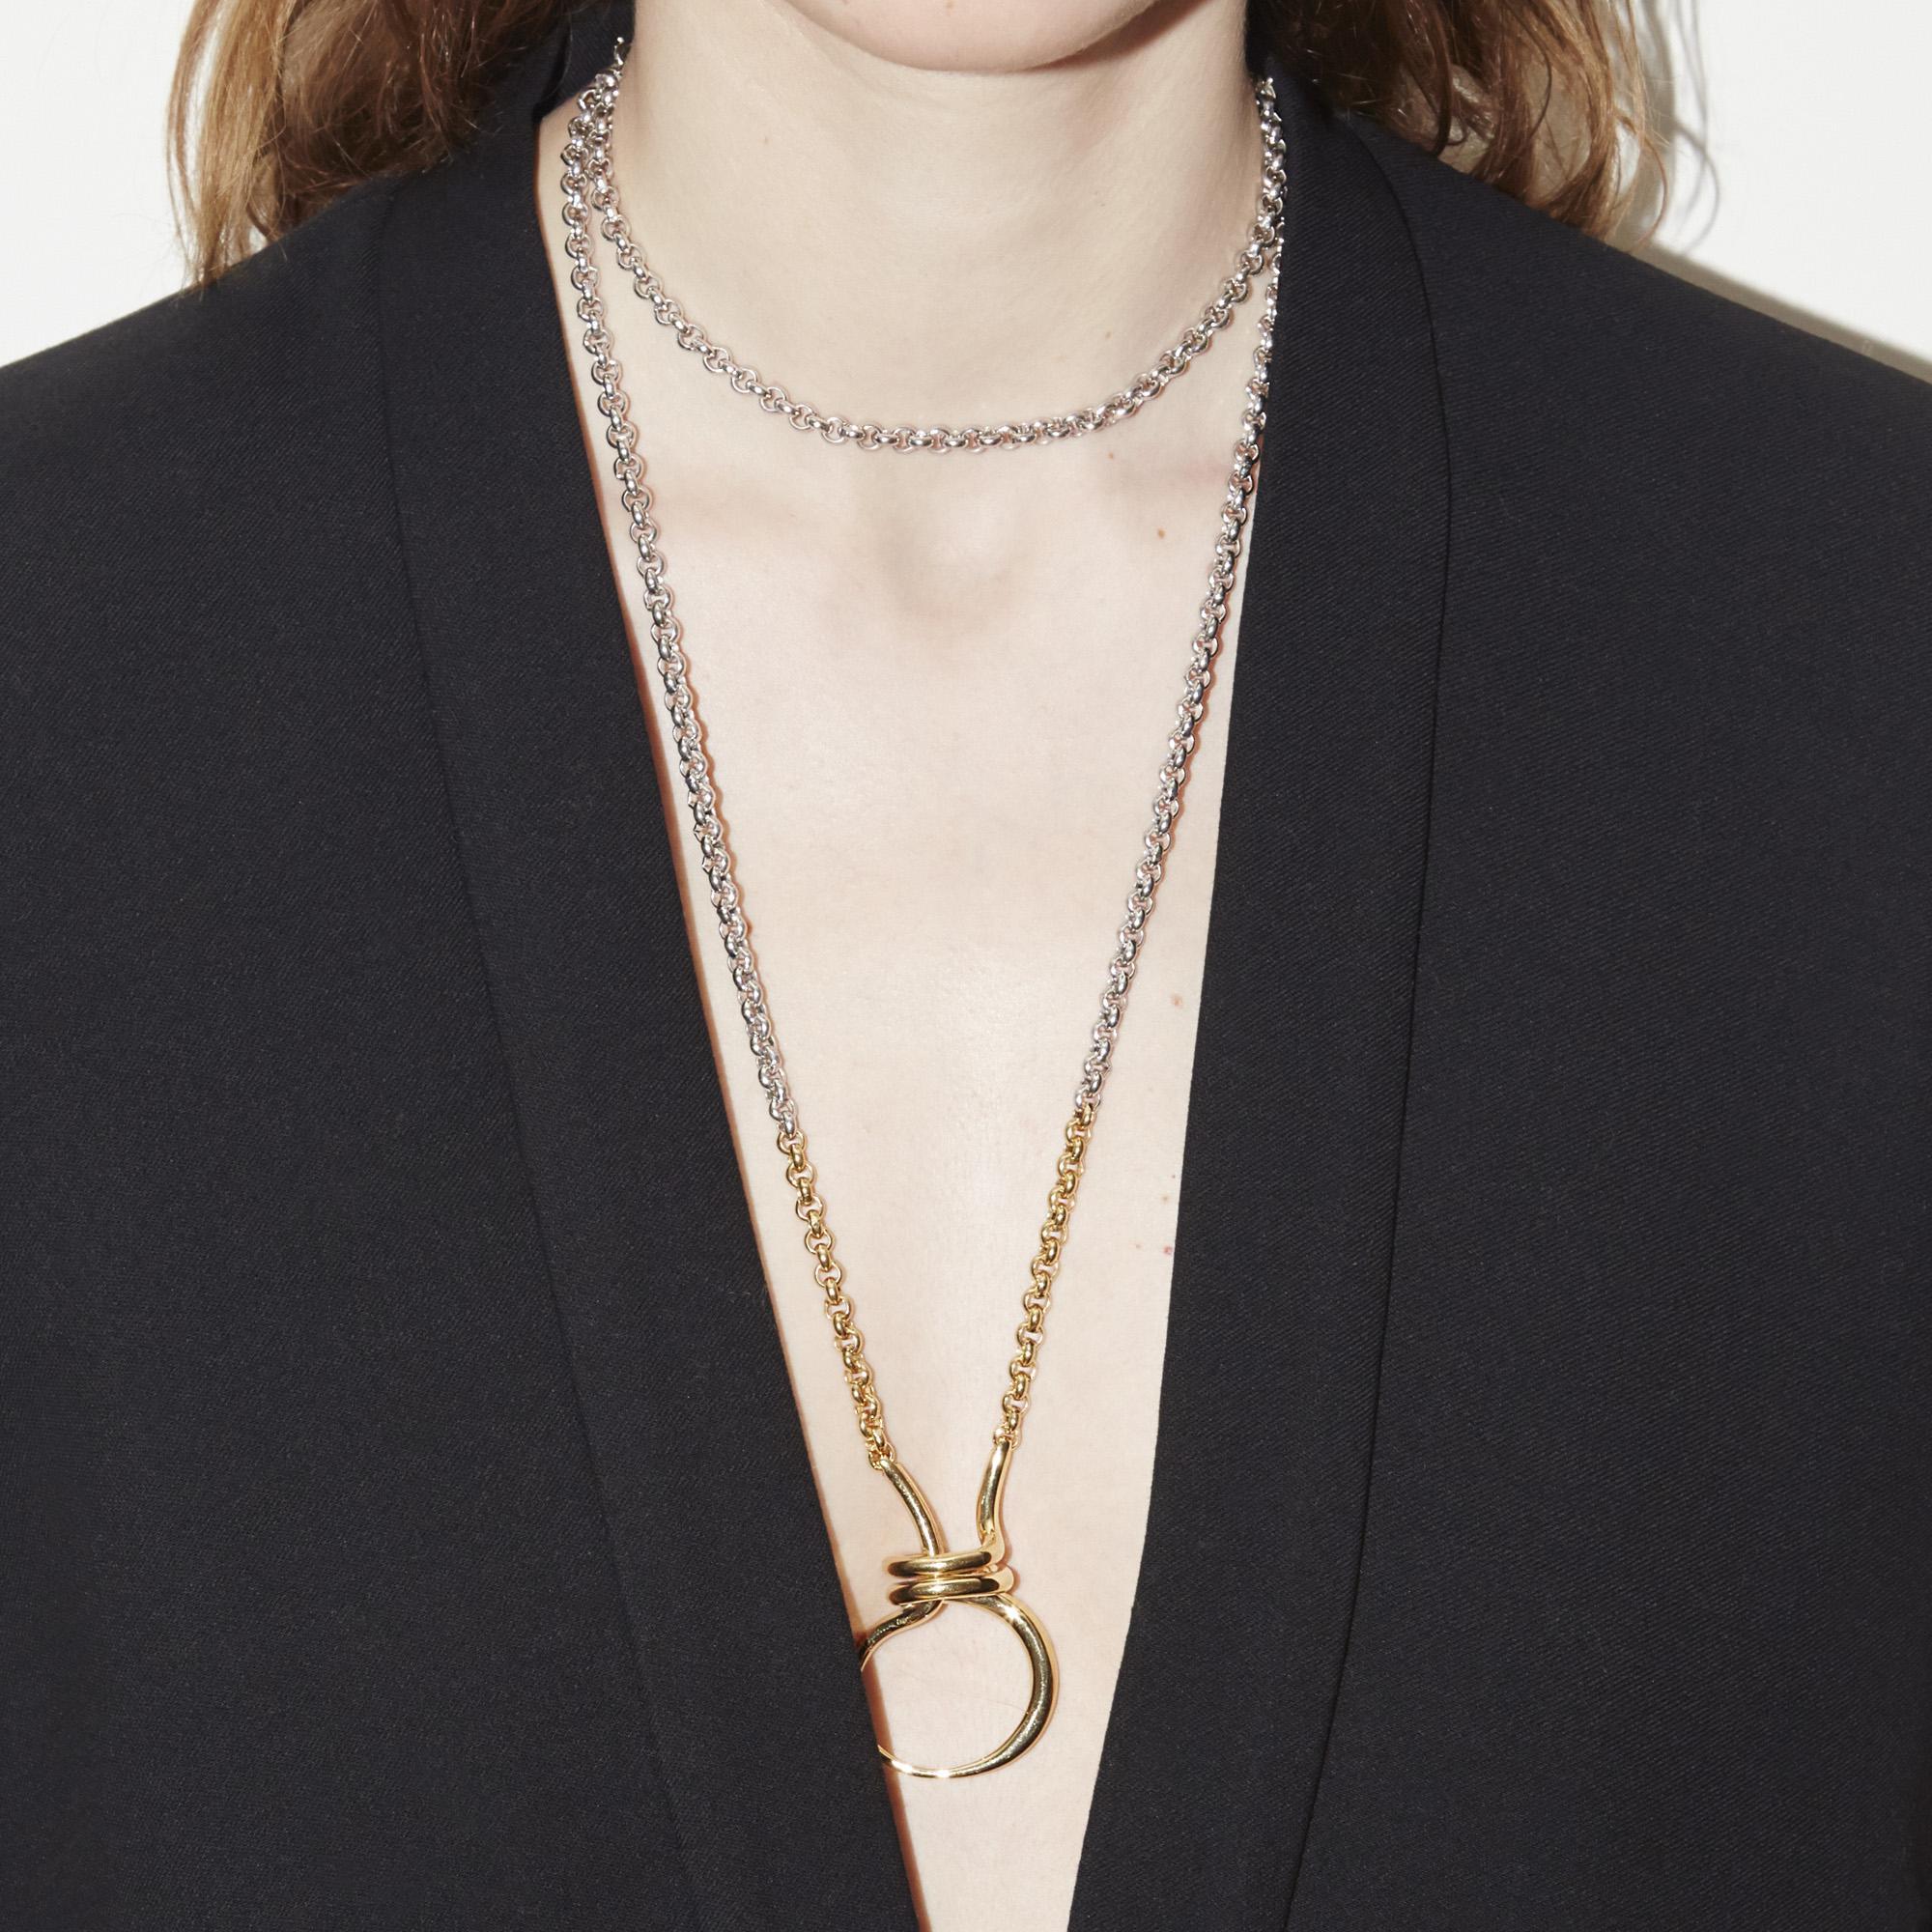 Charlotte Chesnais Round trip necklace BAHMkoOF